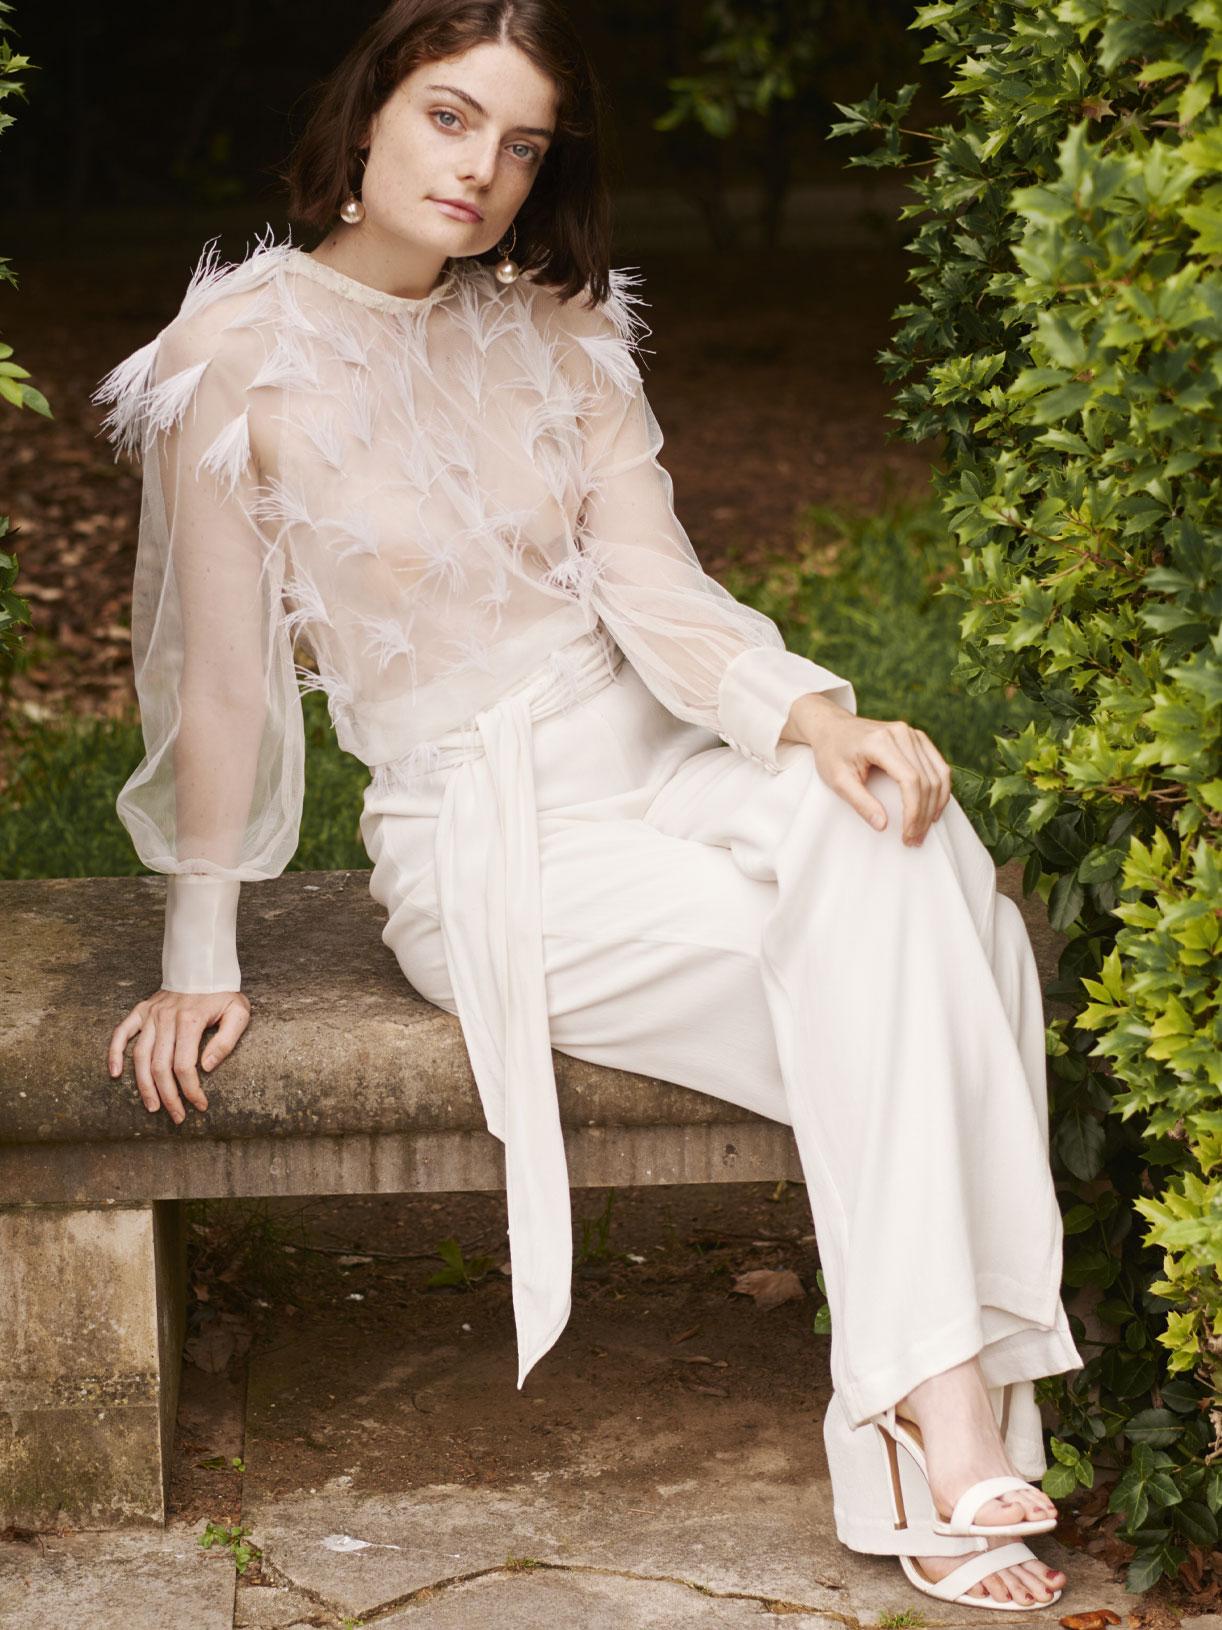 Amour - Pantalon de mariée